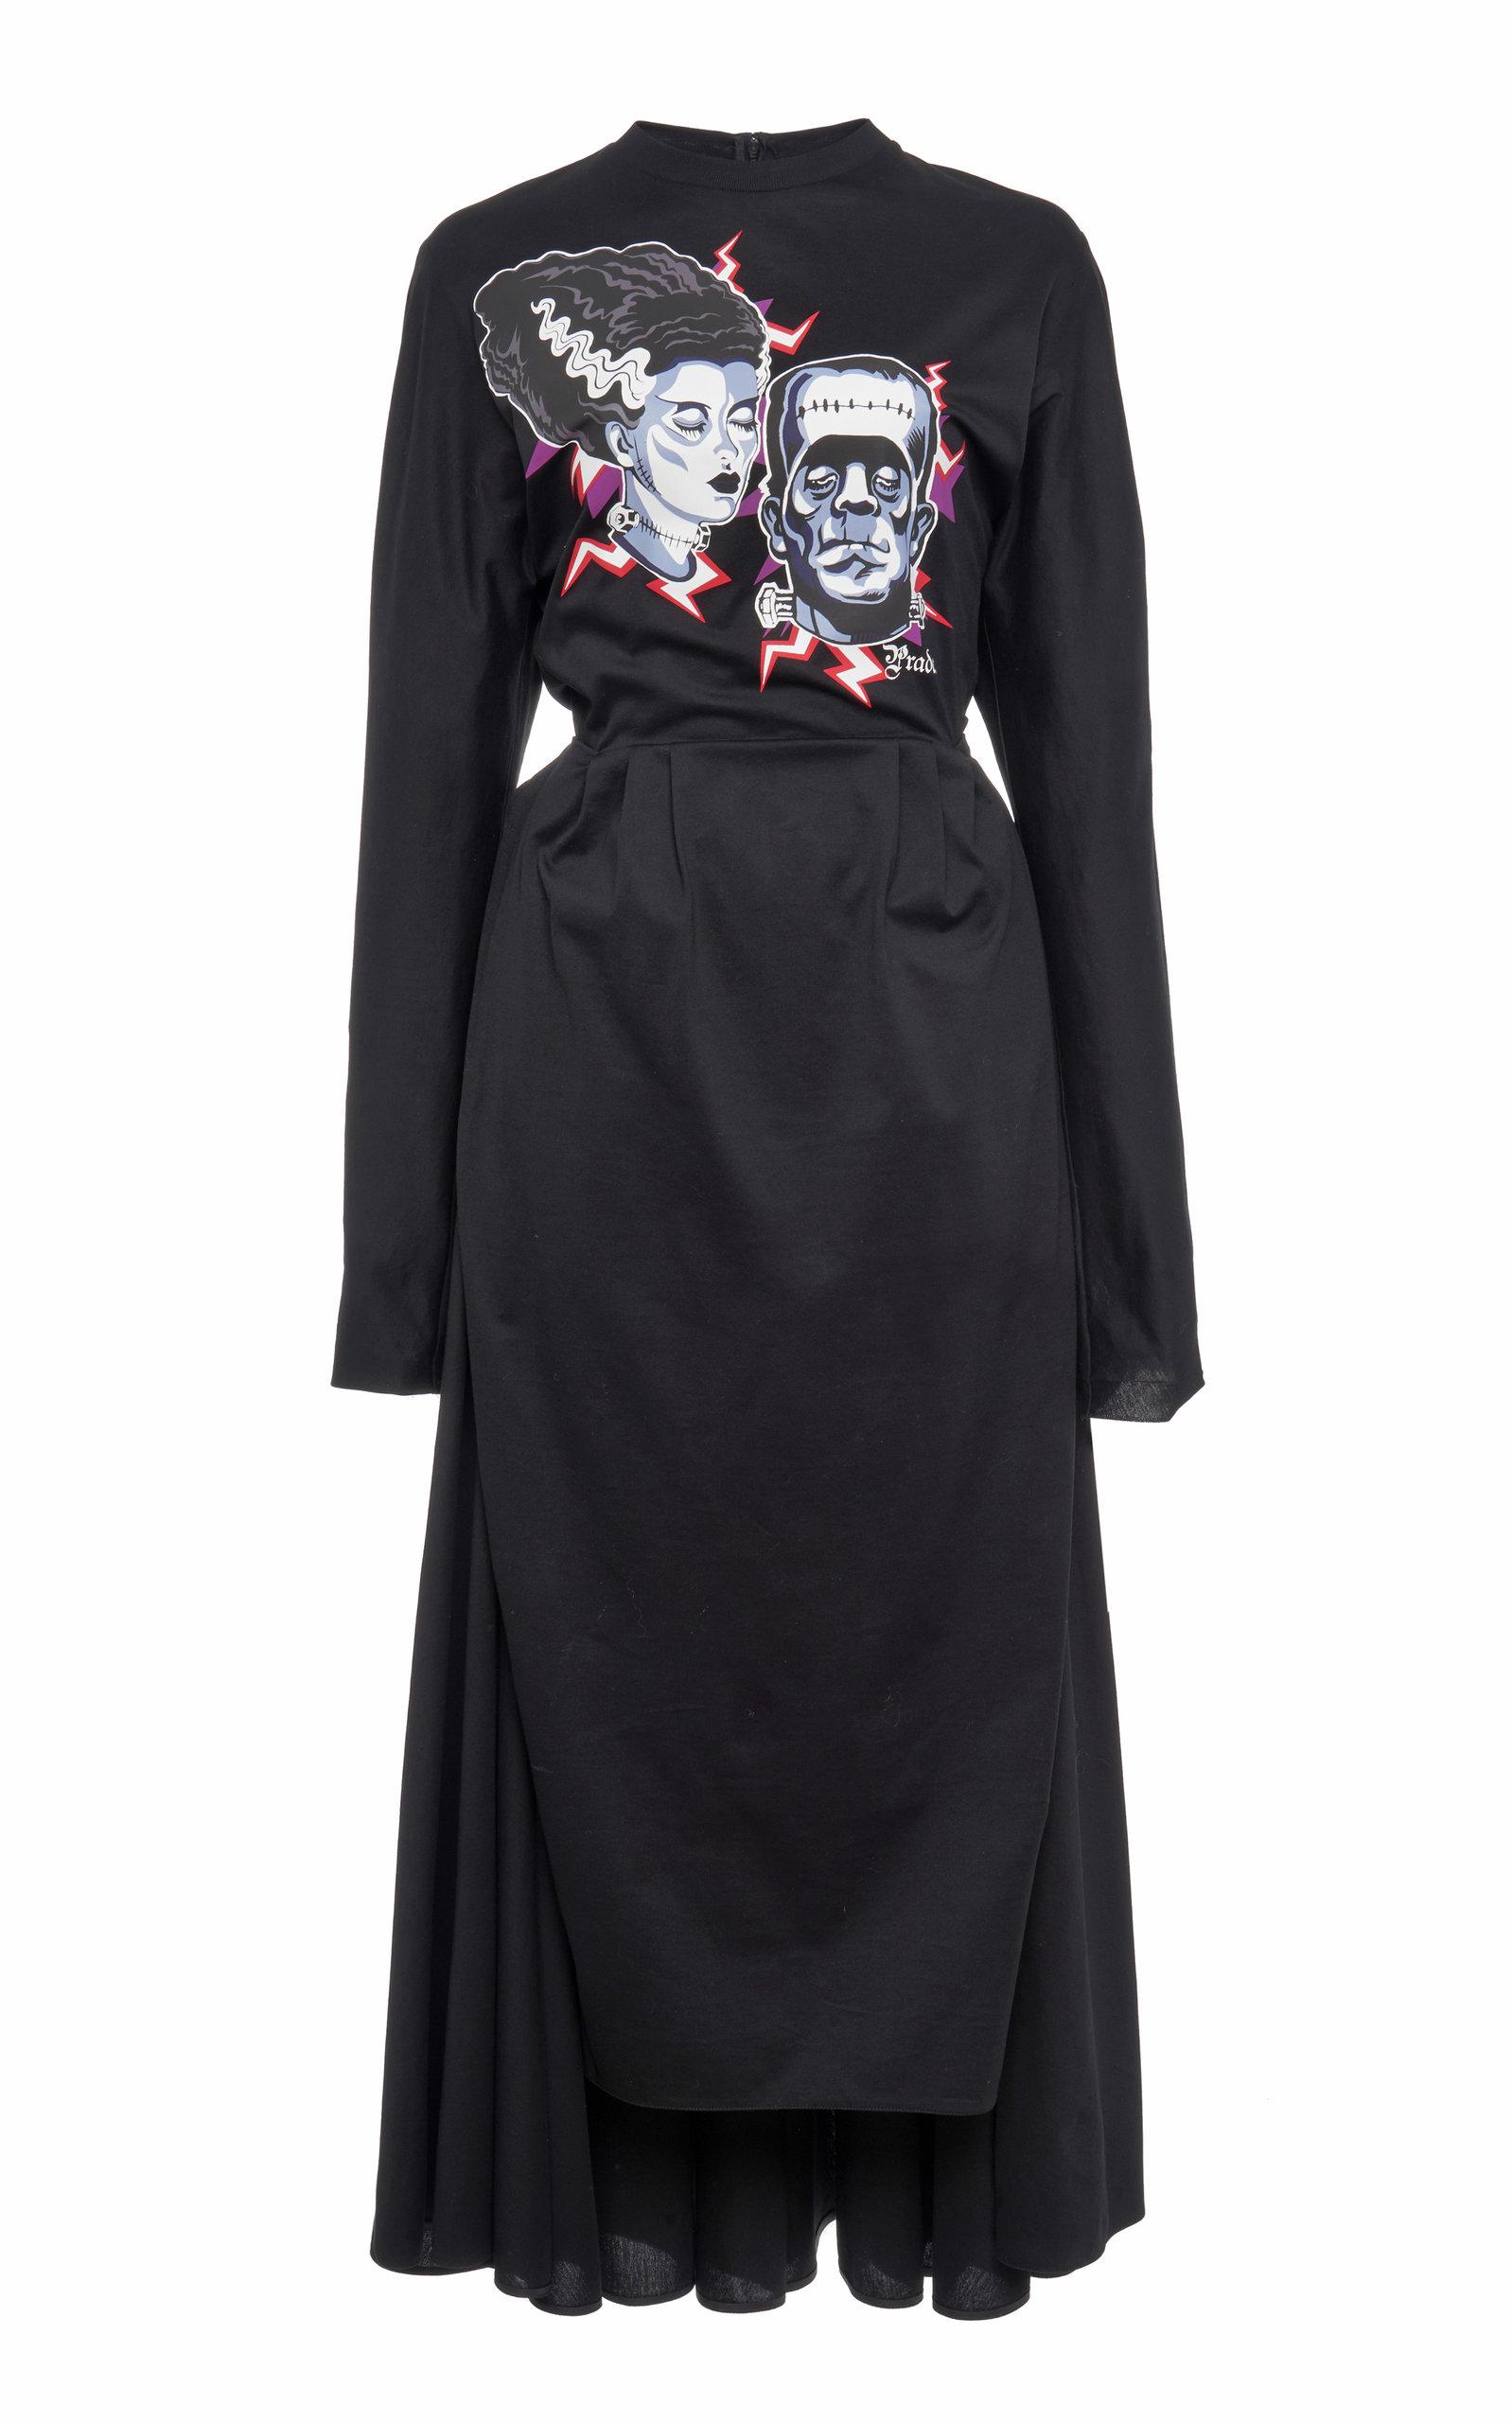 Buy Prada Asymmetric Printed Cotton-Poplin Dress online, shop Prada at the best price